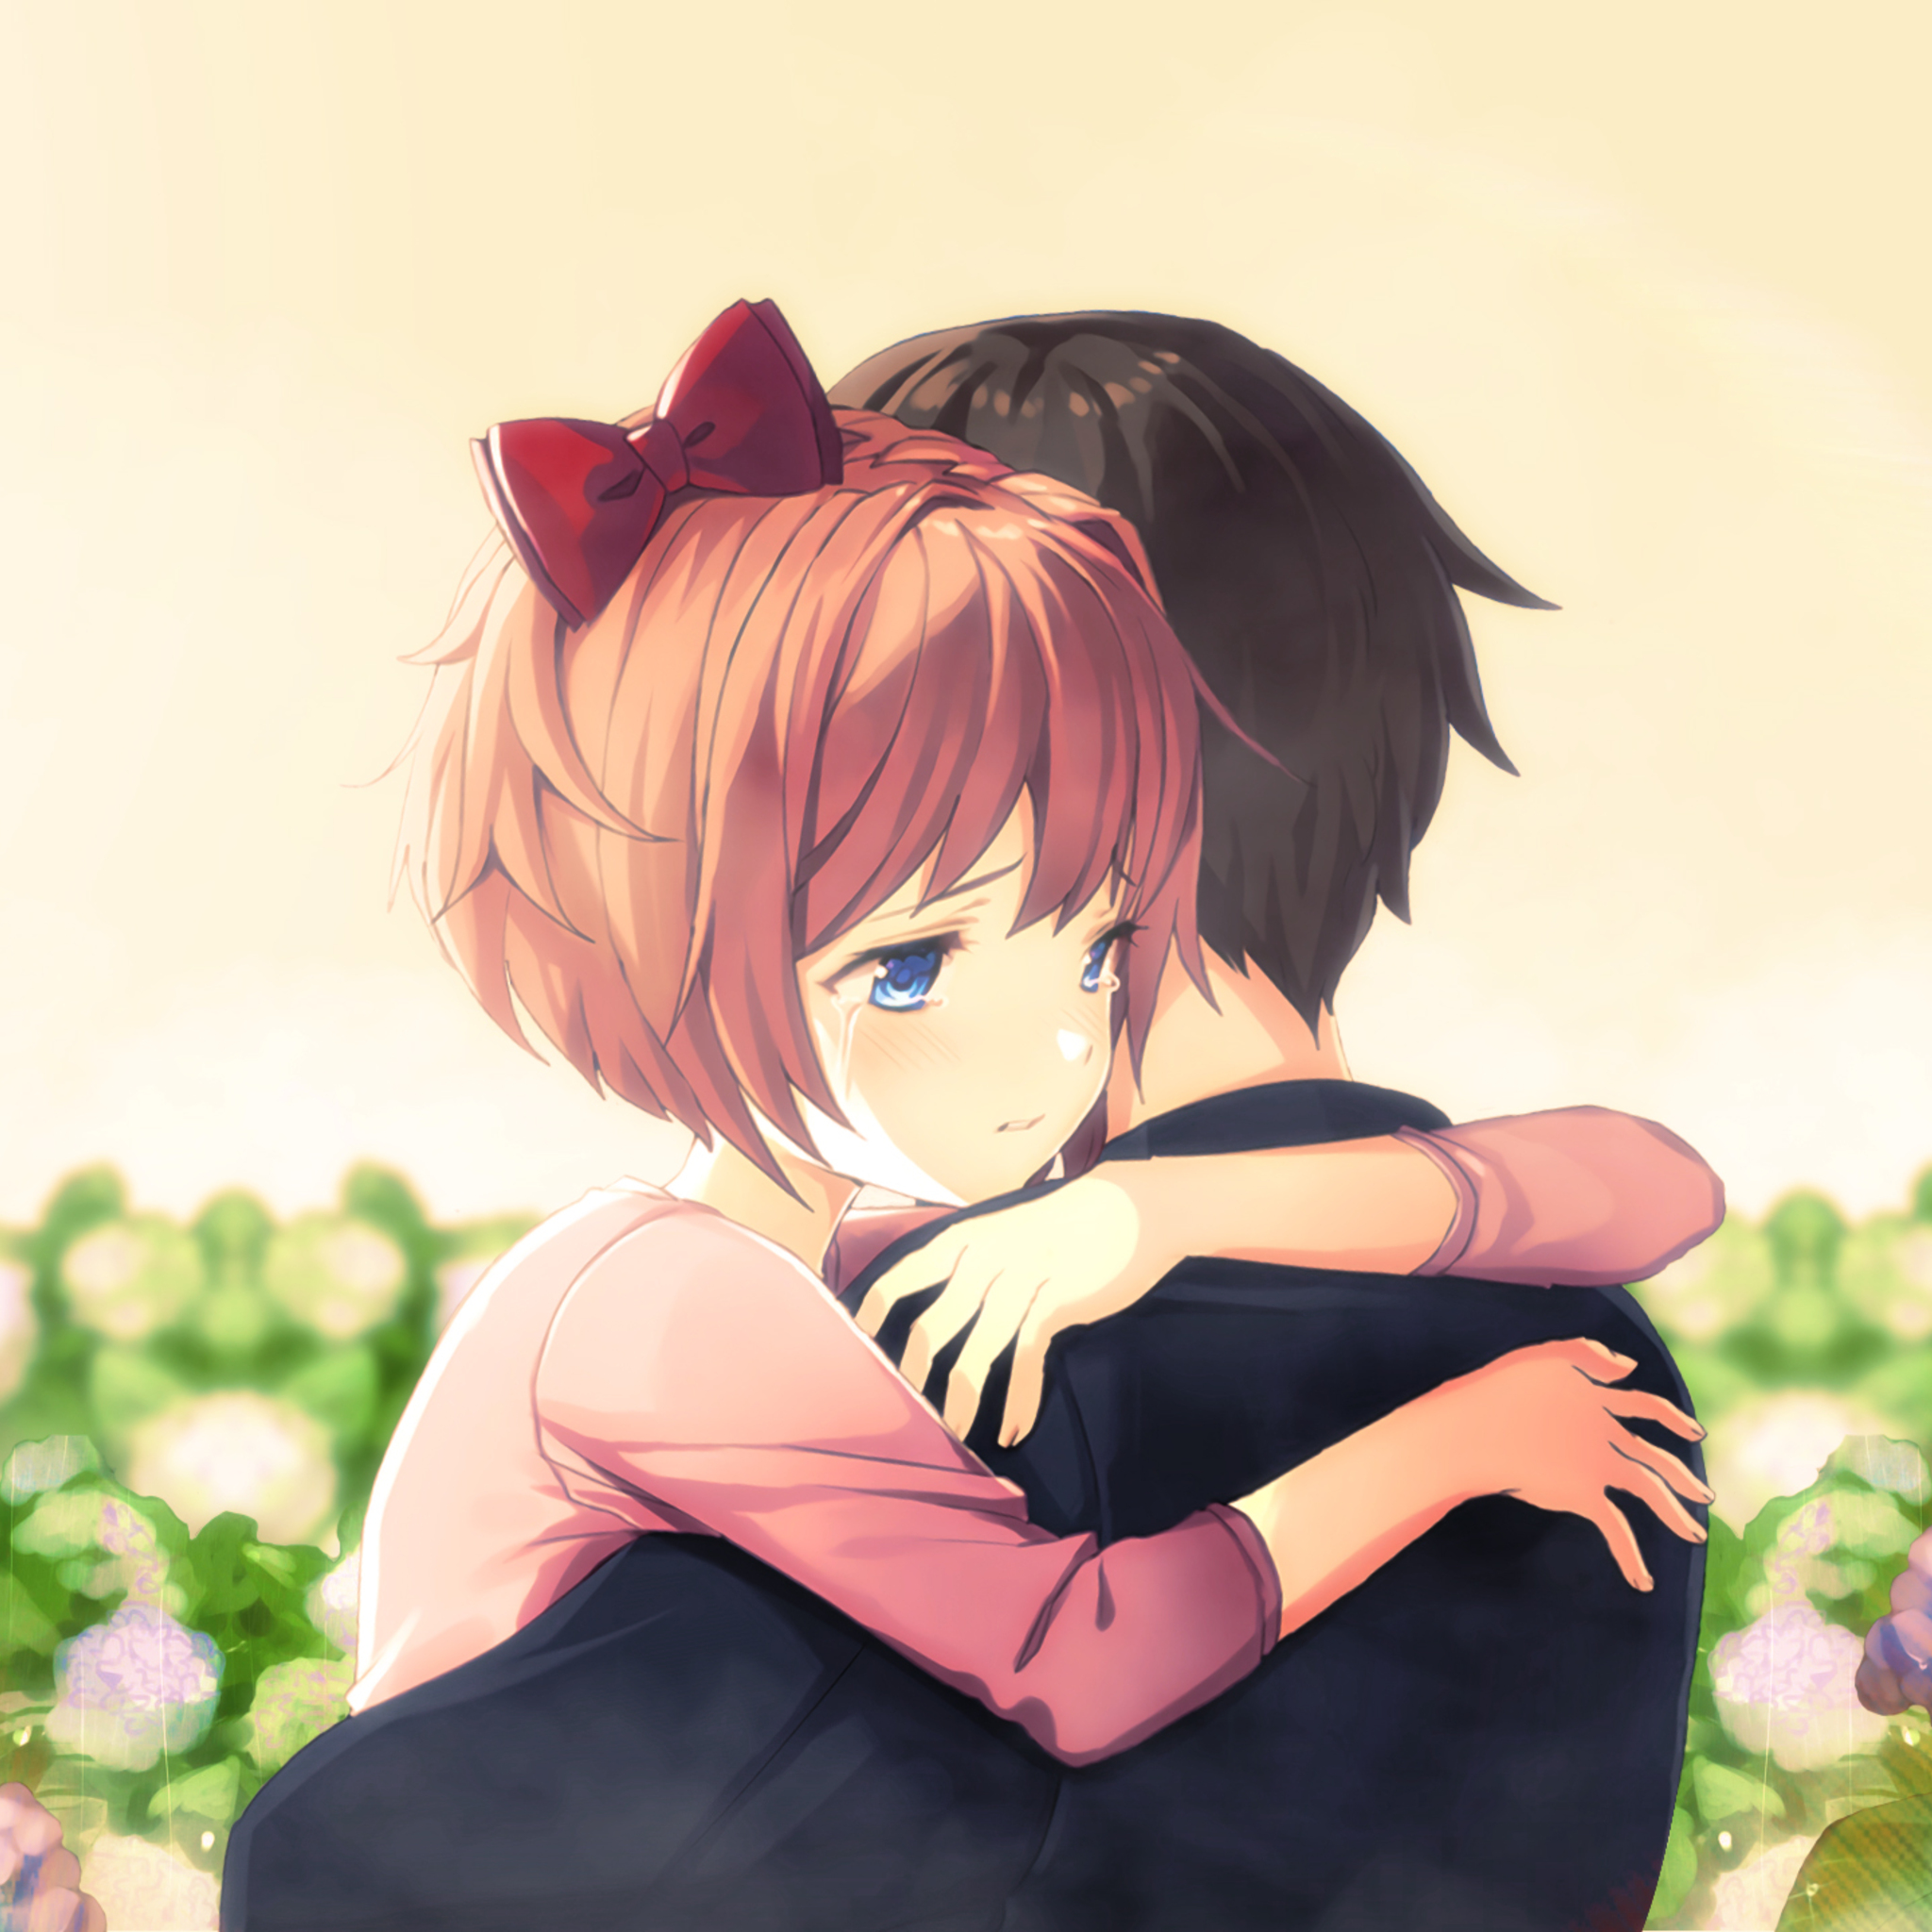 2048x2048 Cute Anime Couple Hug Ipad Air HD 4k Wallpapers ...